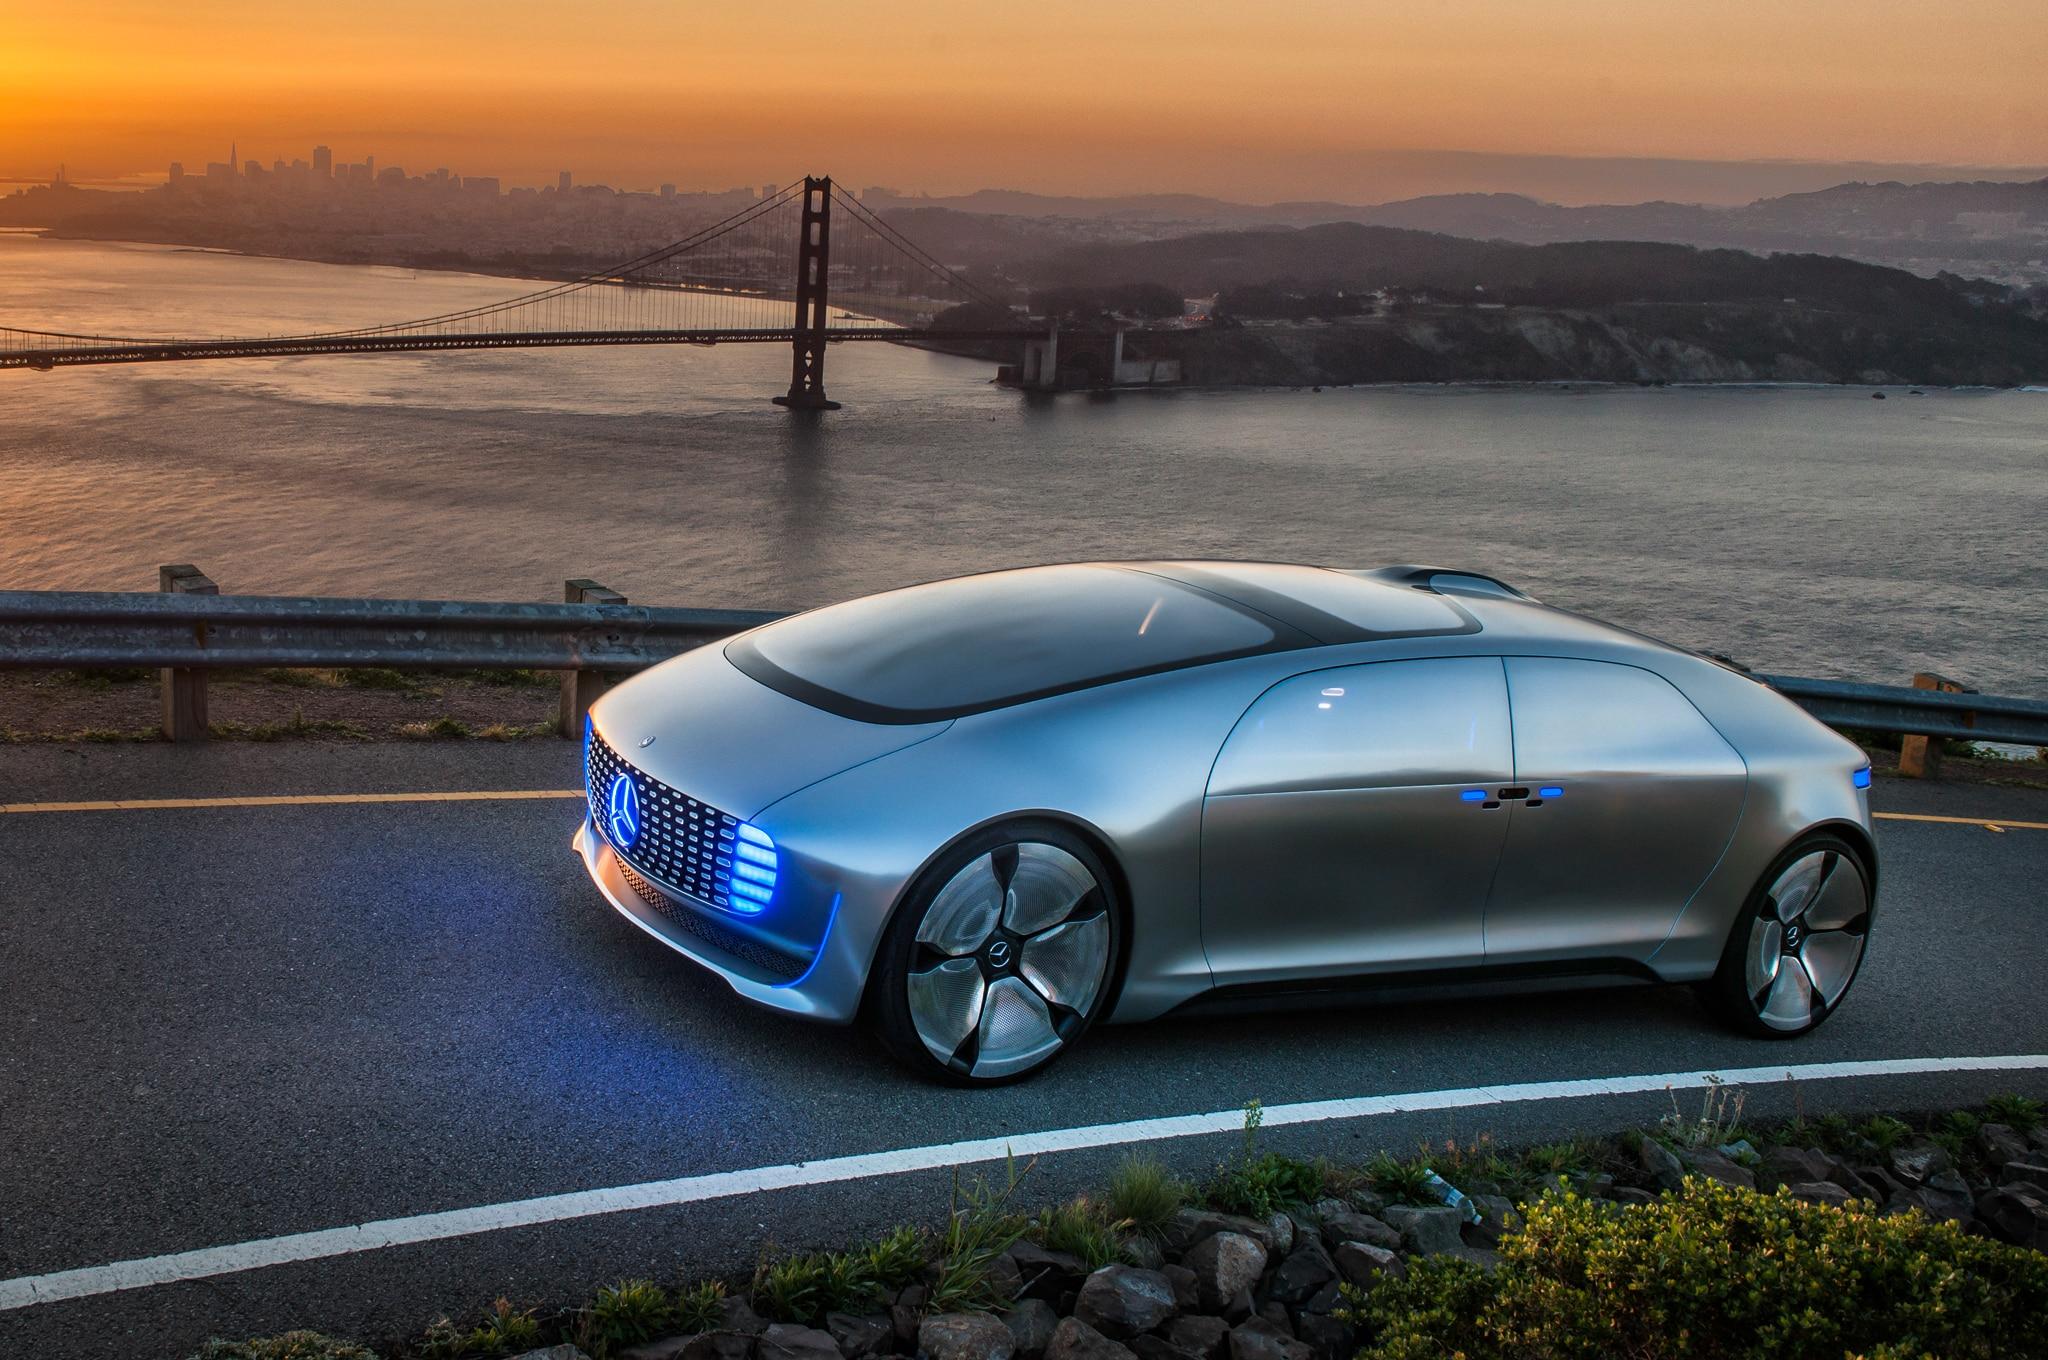 Mercedes benz vision tokyo teaser previews autonomous for Mercedes benz f 015 price